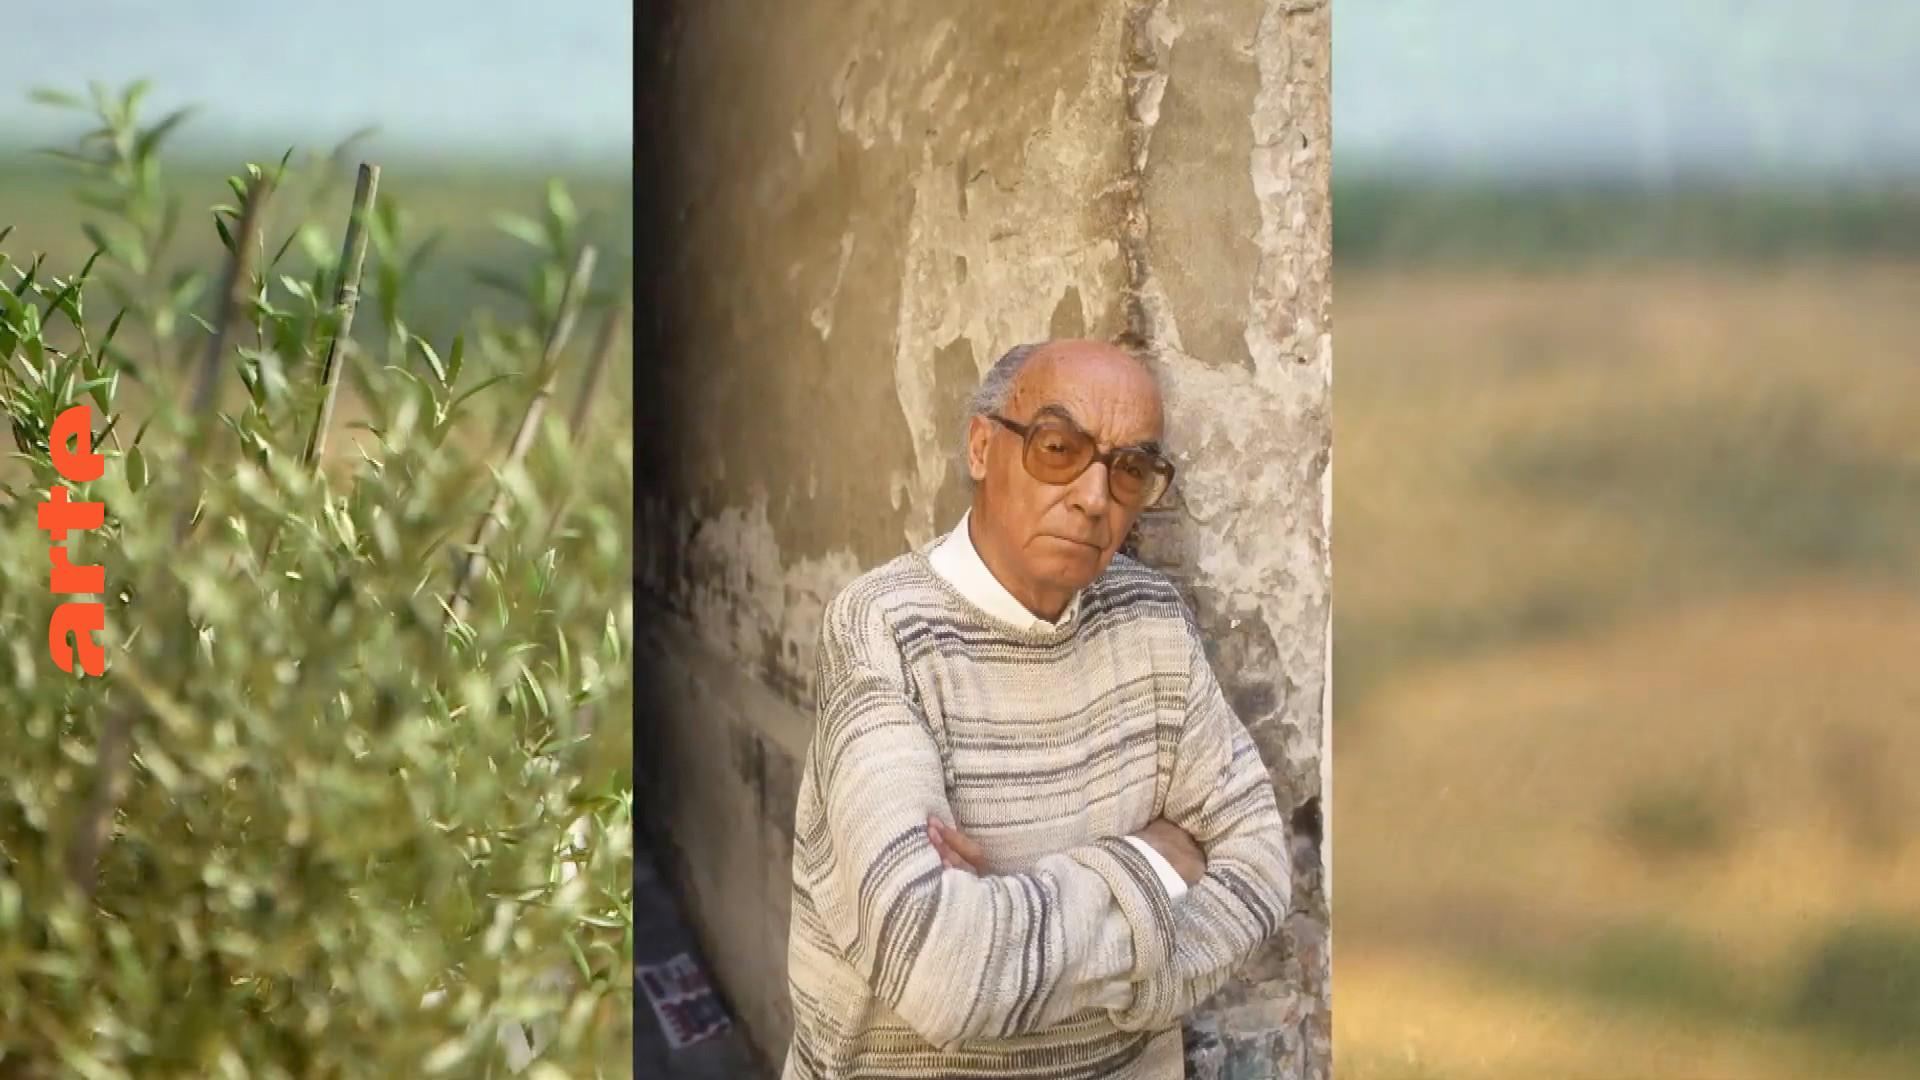 L'Alentejo vibrant de José Saramago - Invitation au voyage - Regarder le documentaire complet | ARTE